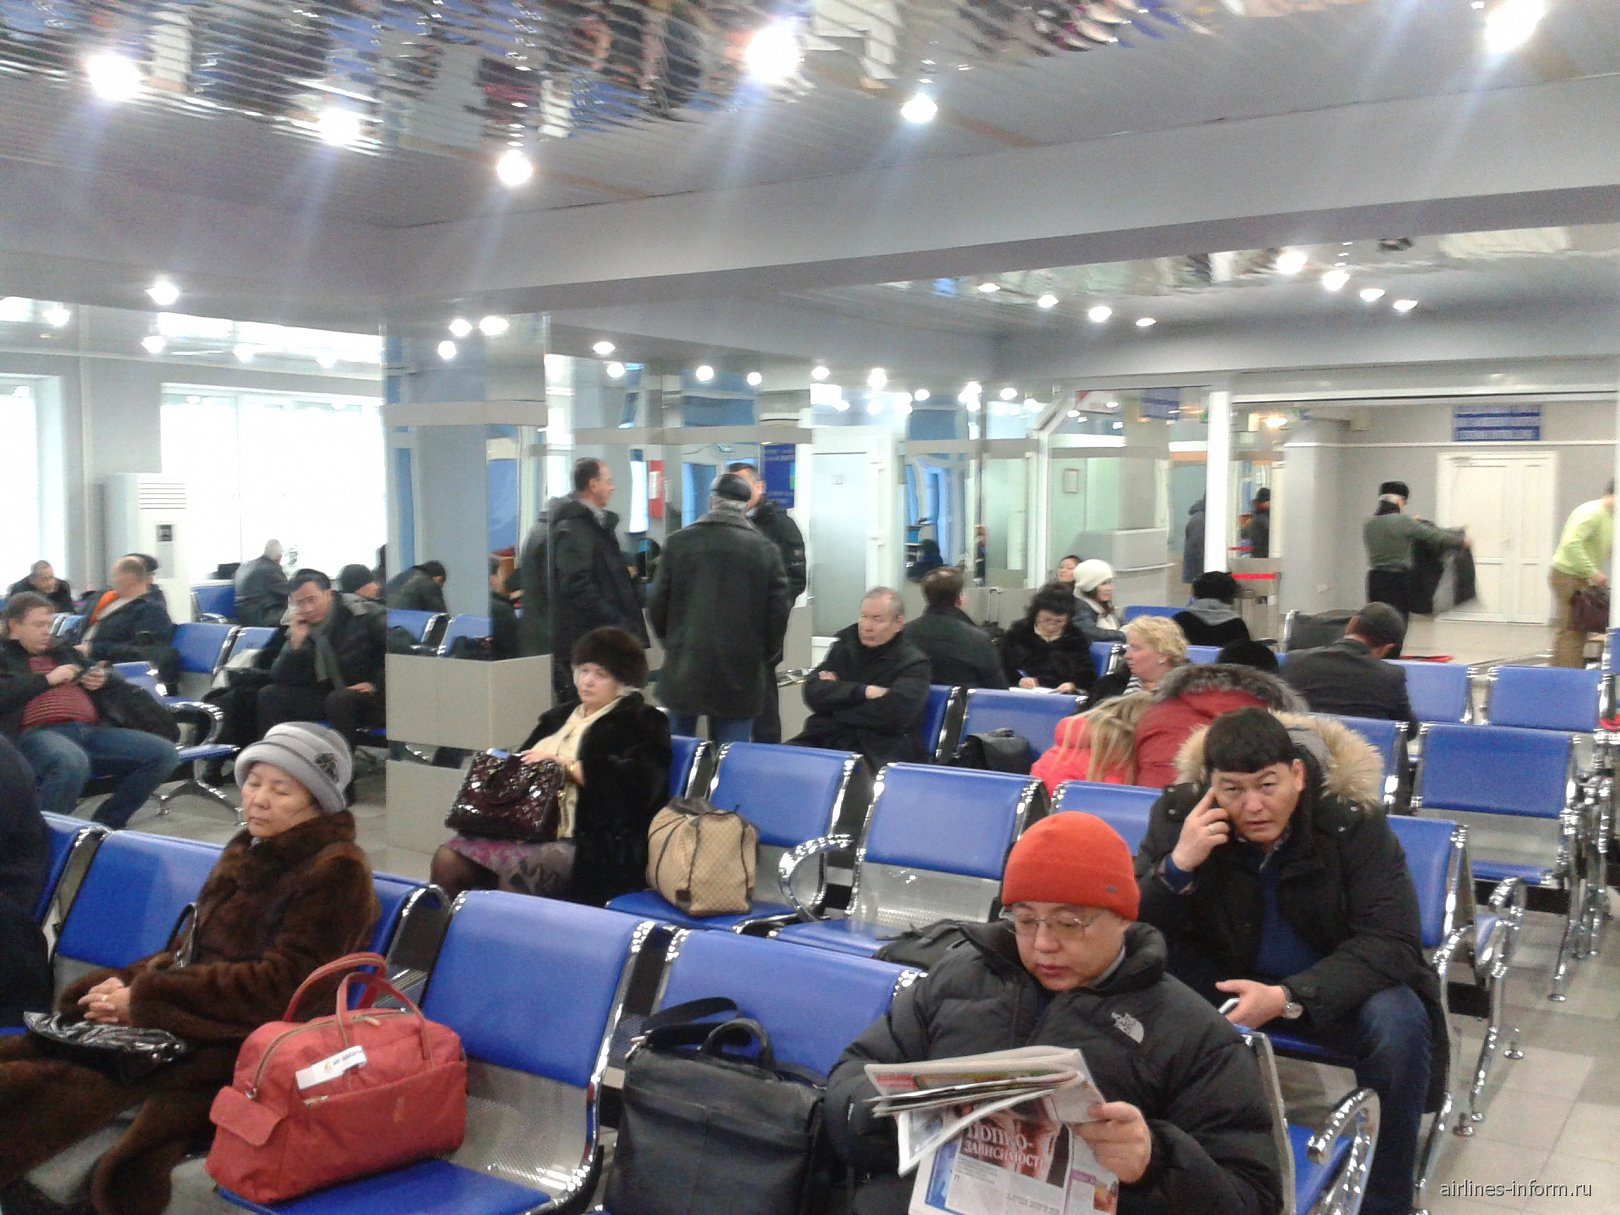 Зал ожидания в аэропорту Павлодар